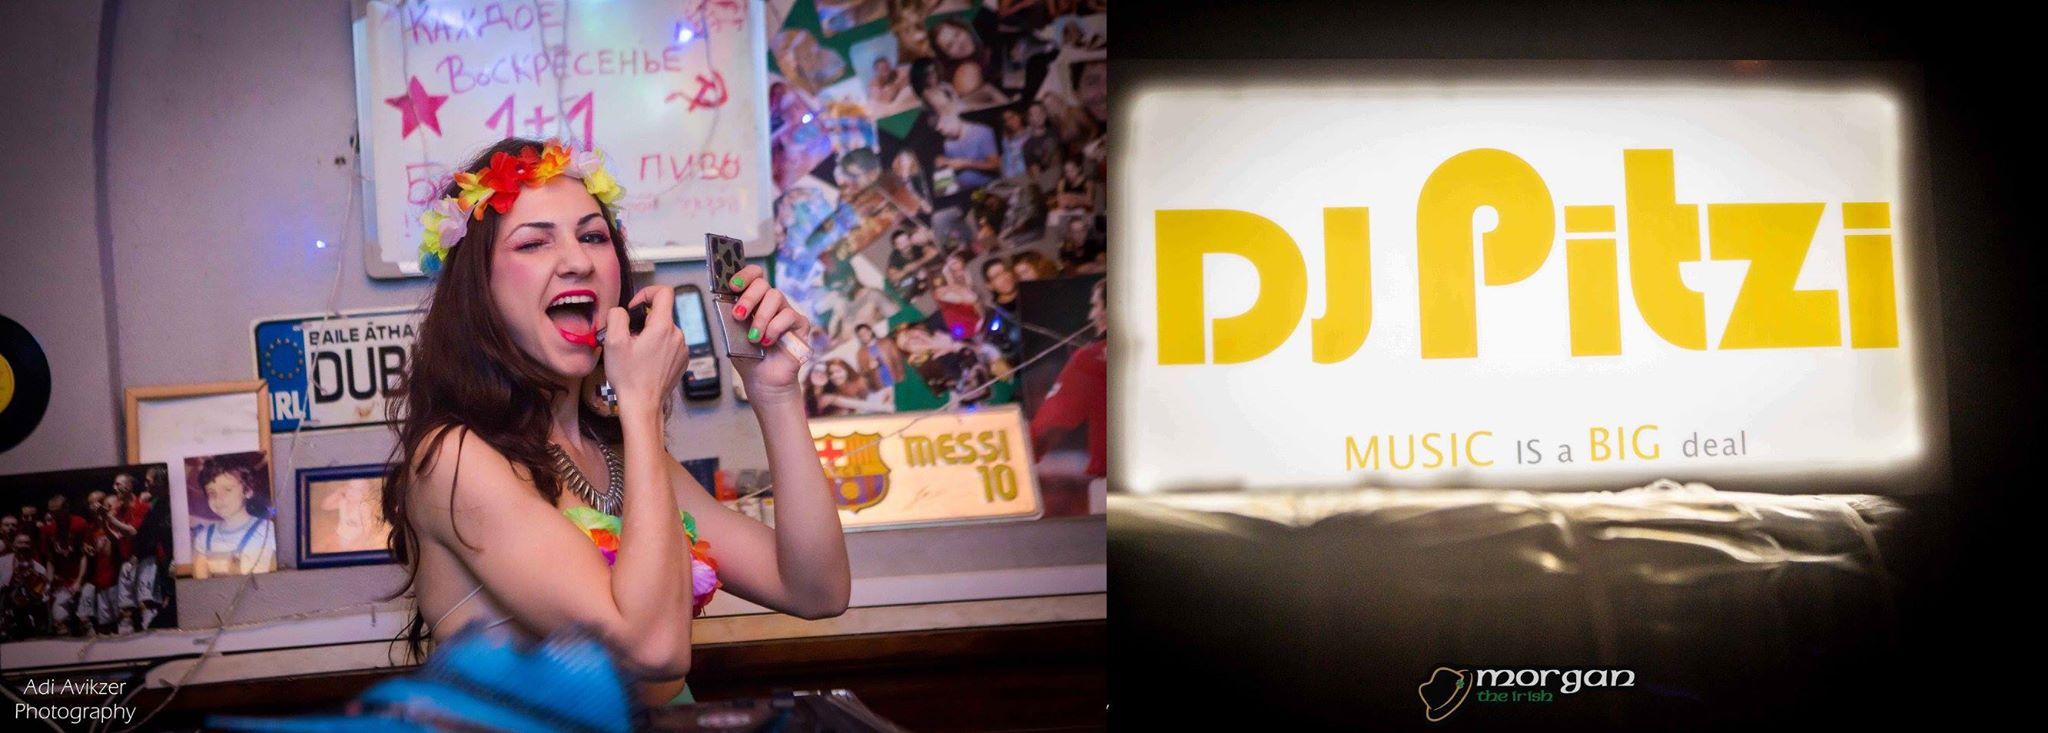 DJ Pitzi.Purim festival 2016.002